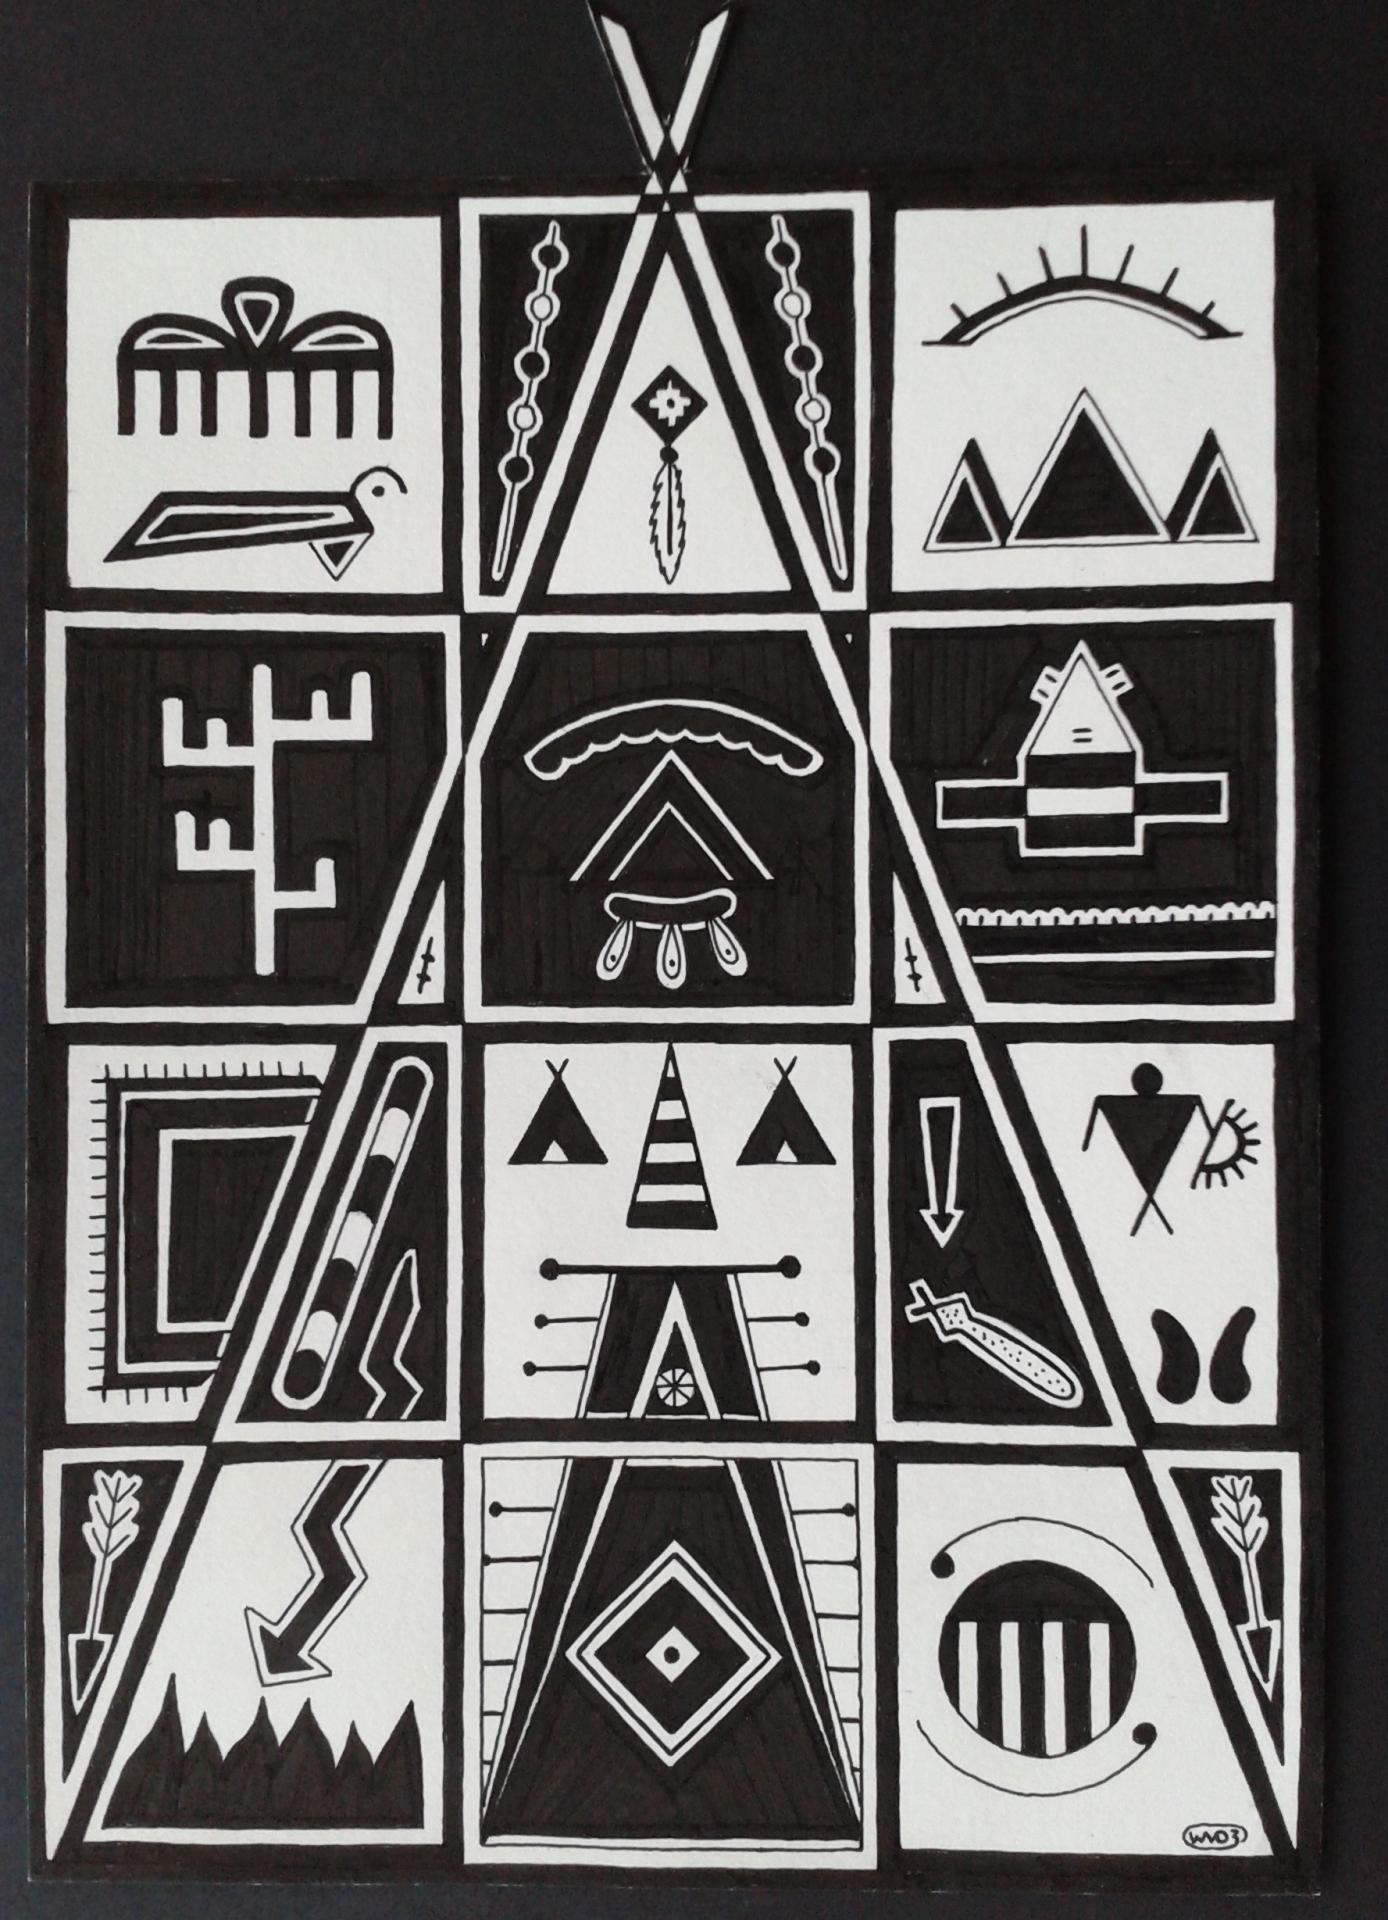 Bantu symbols and meanings menu biocorpaavc